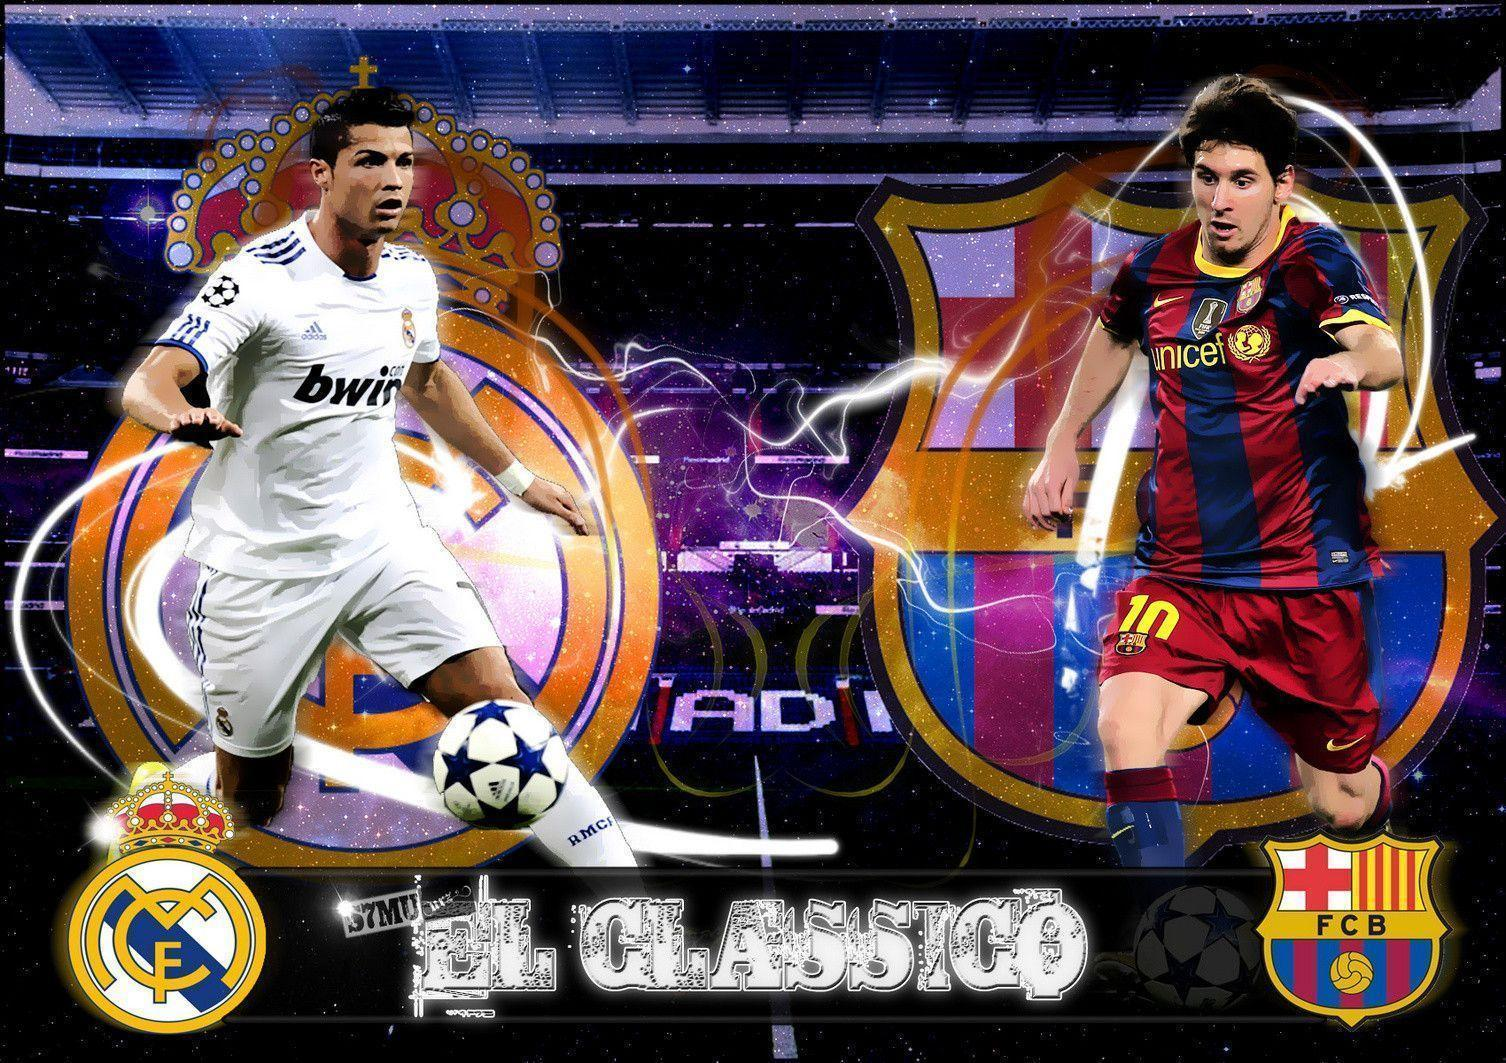 Messi Vs Ronaldo Wallpapers 2016 Wallpaper Cave